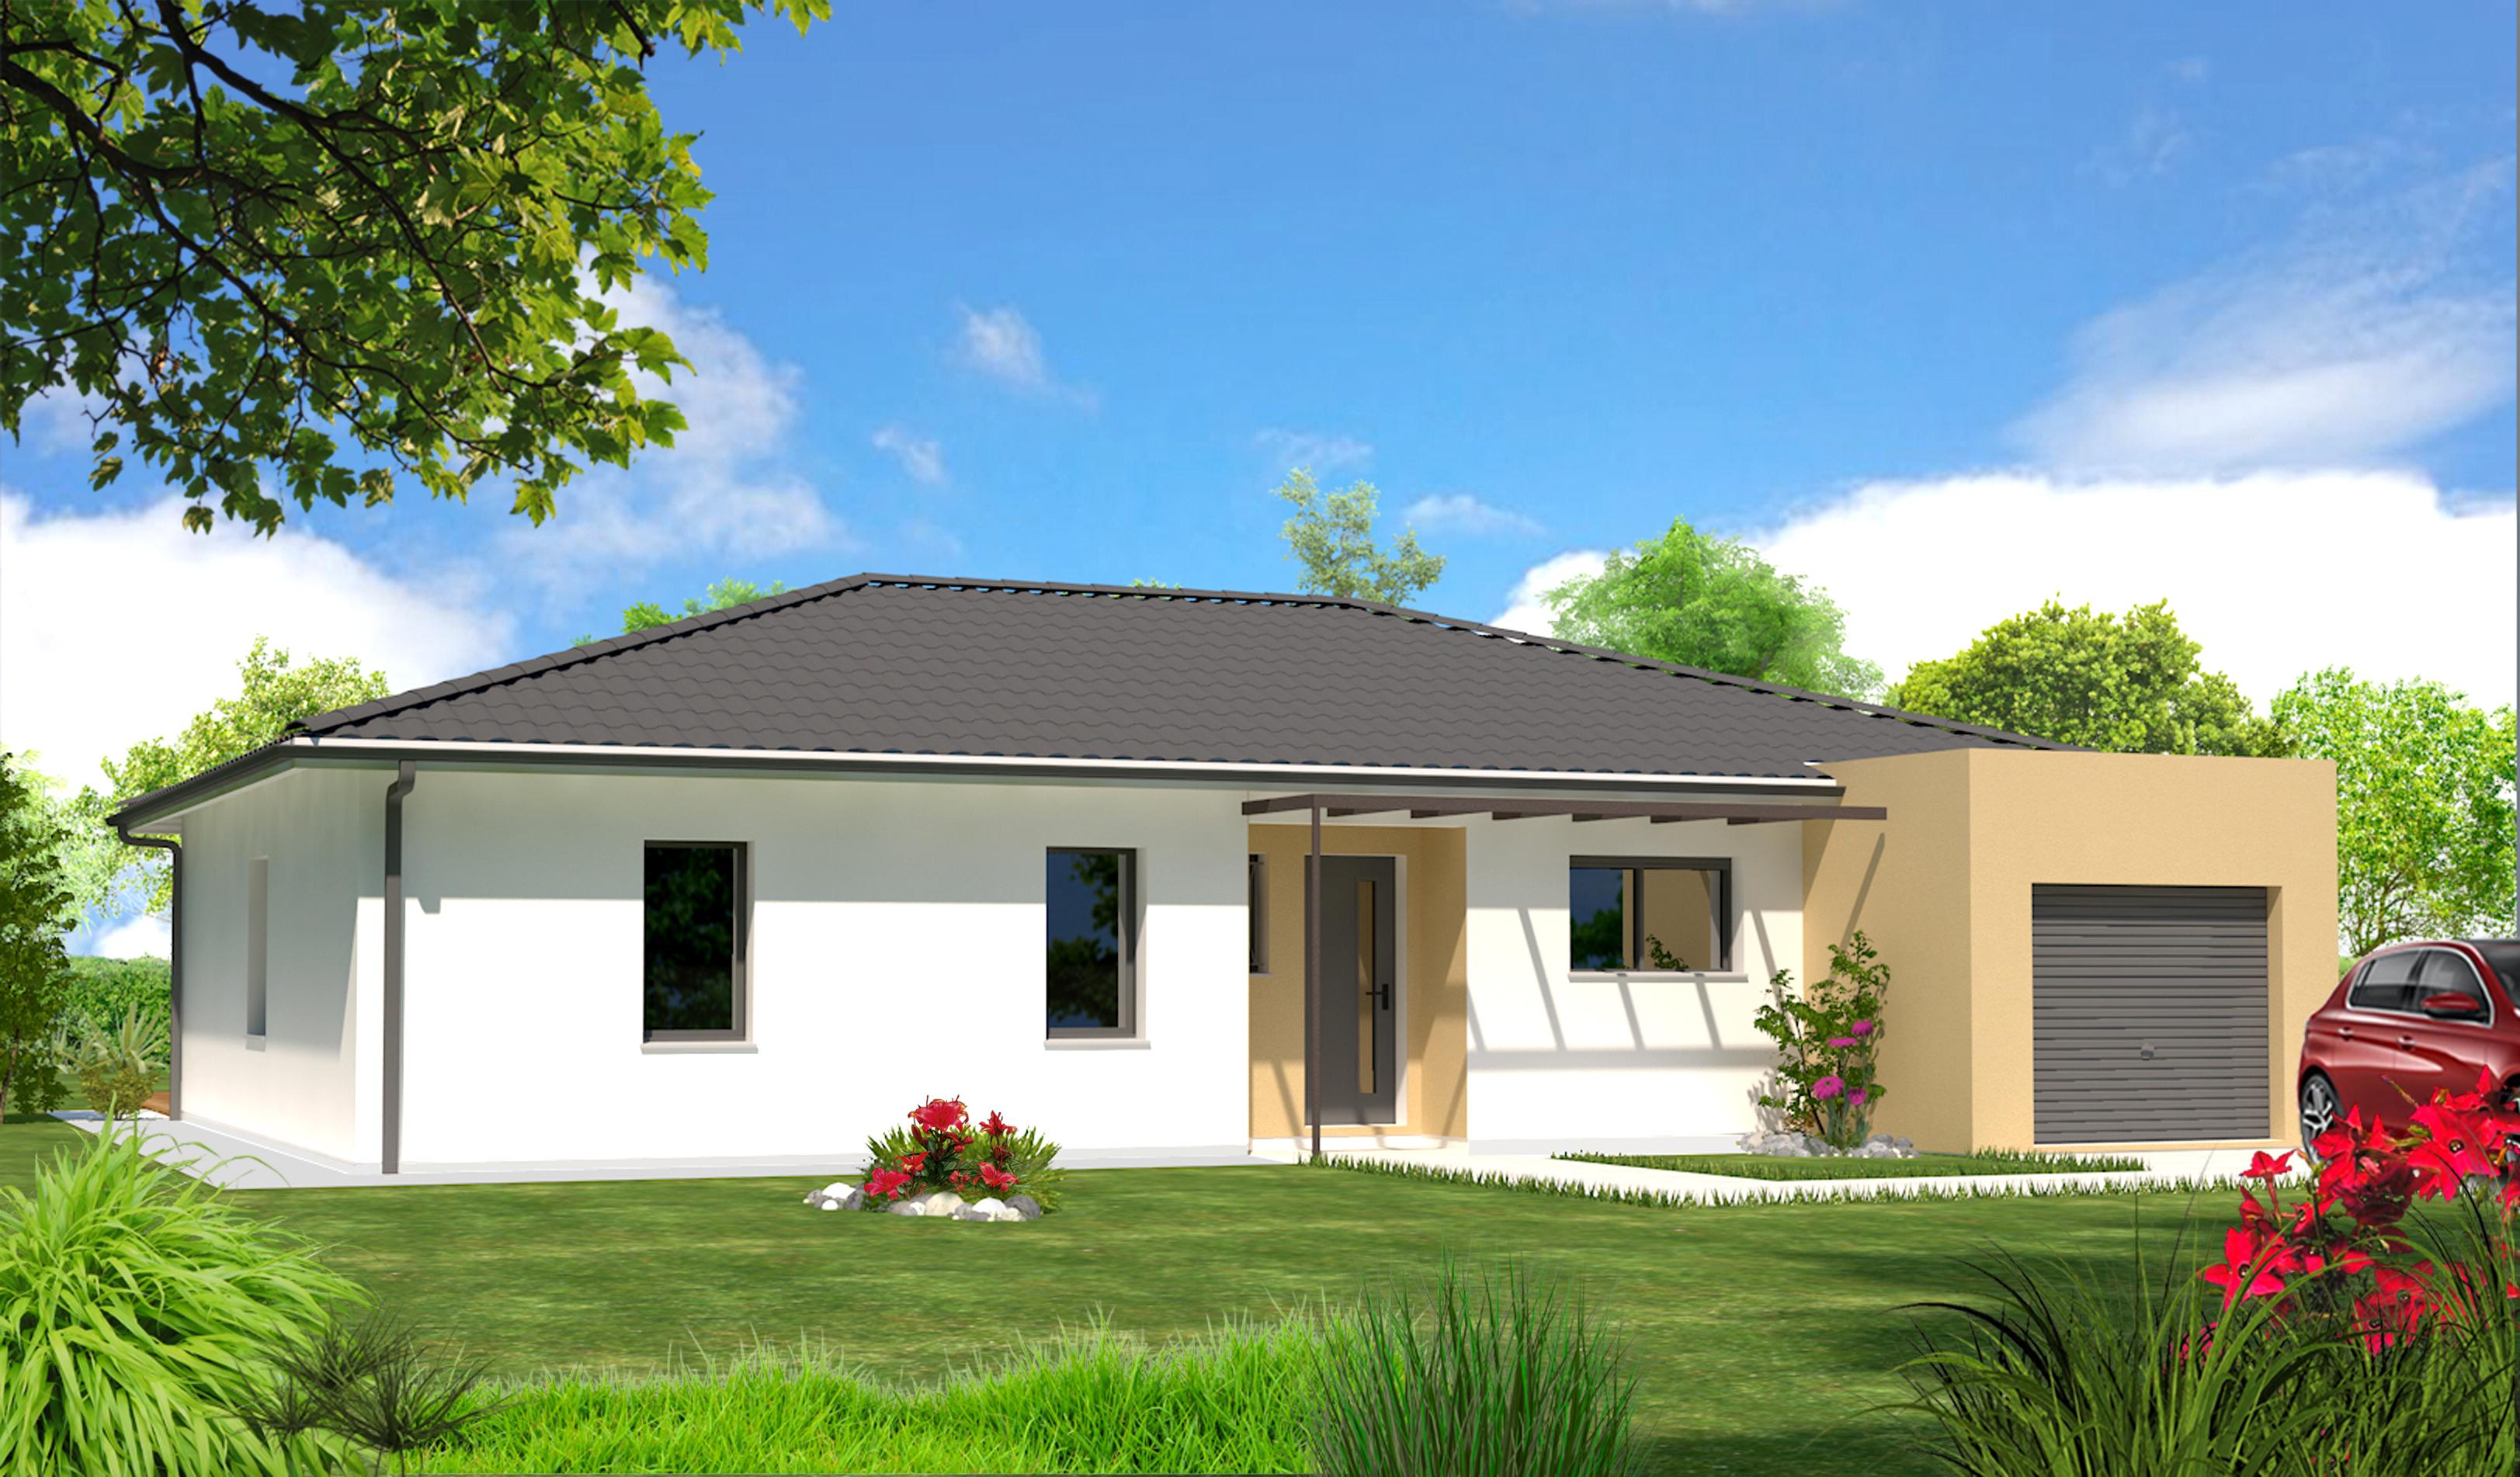 Maeva 33 maisons lara for Maison contemporaine toit terrasse